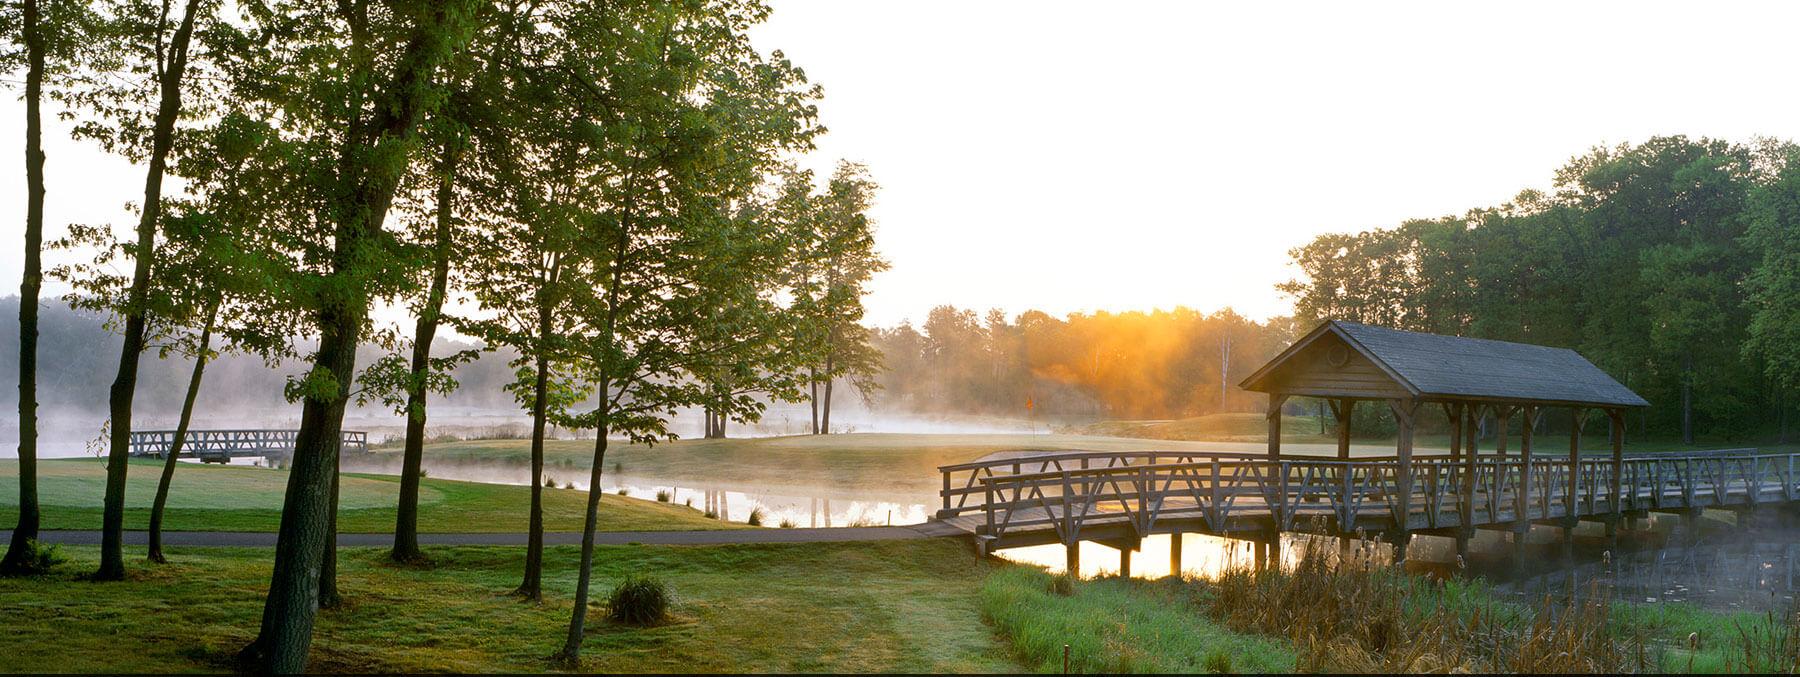 Brainerd golf course - The Classic